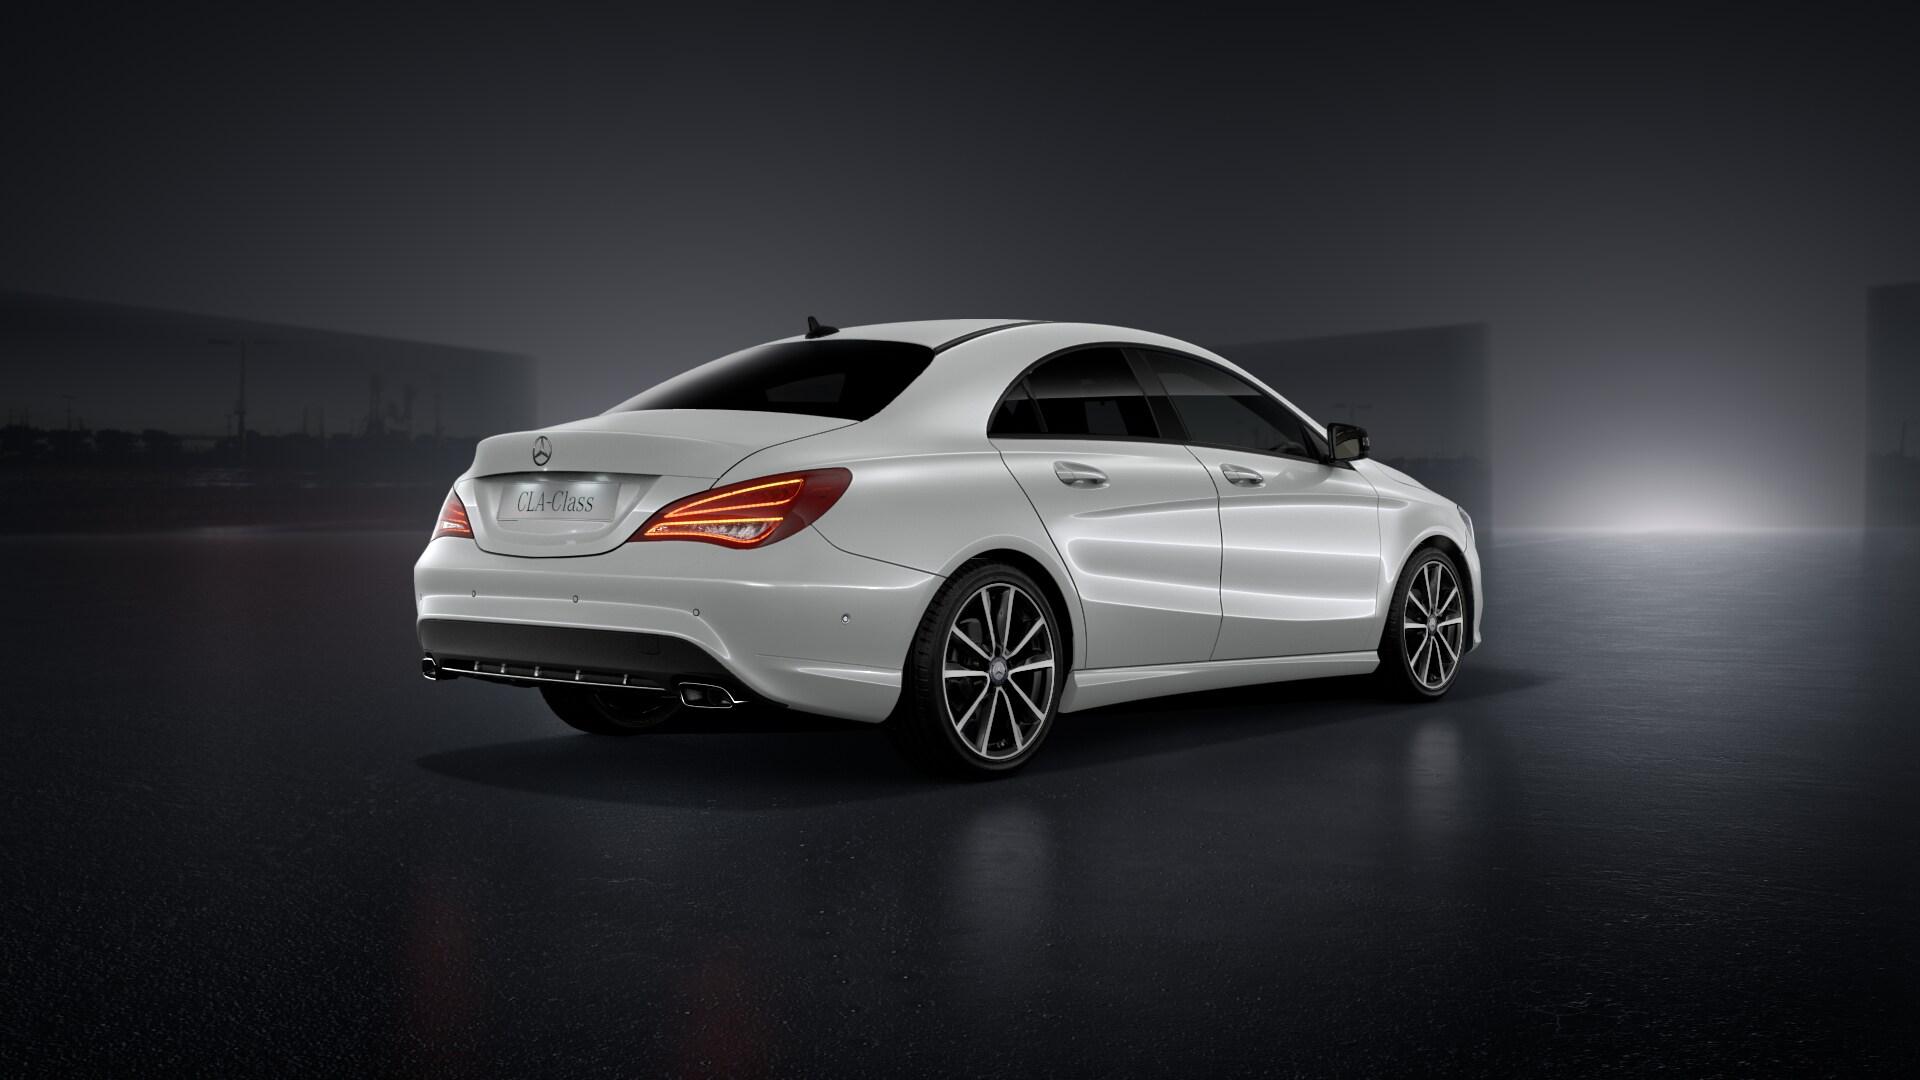 2014 Mercedes Benz Cla 45 Amg Mercedes Cla 200 Amg